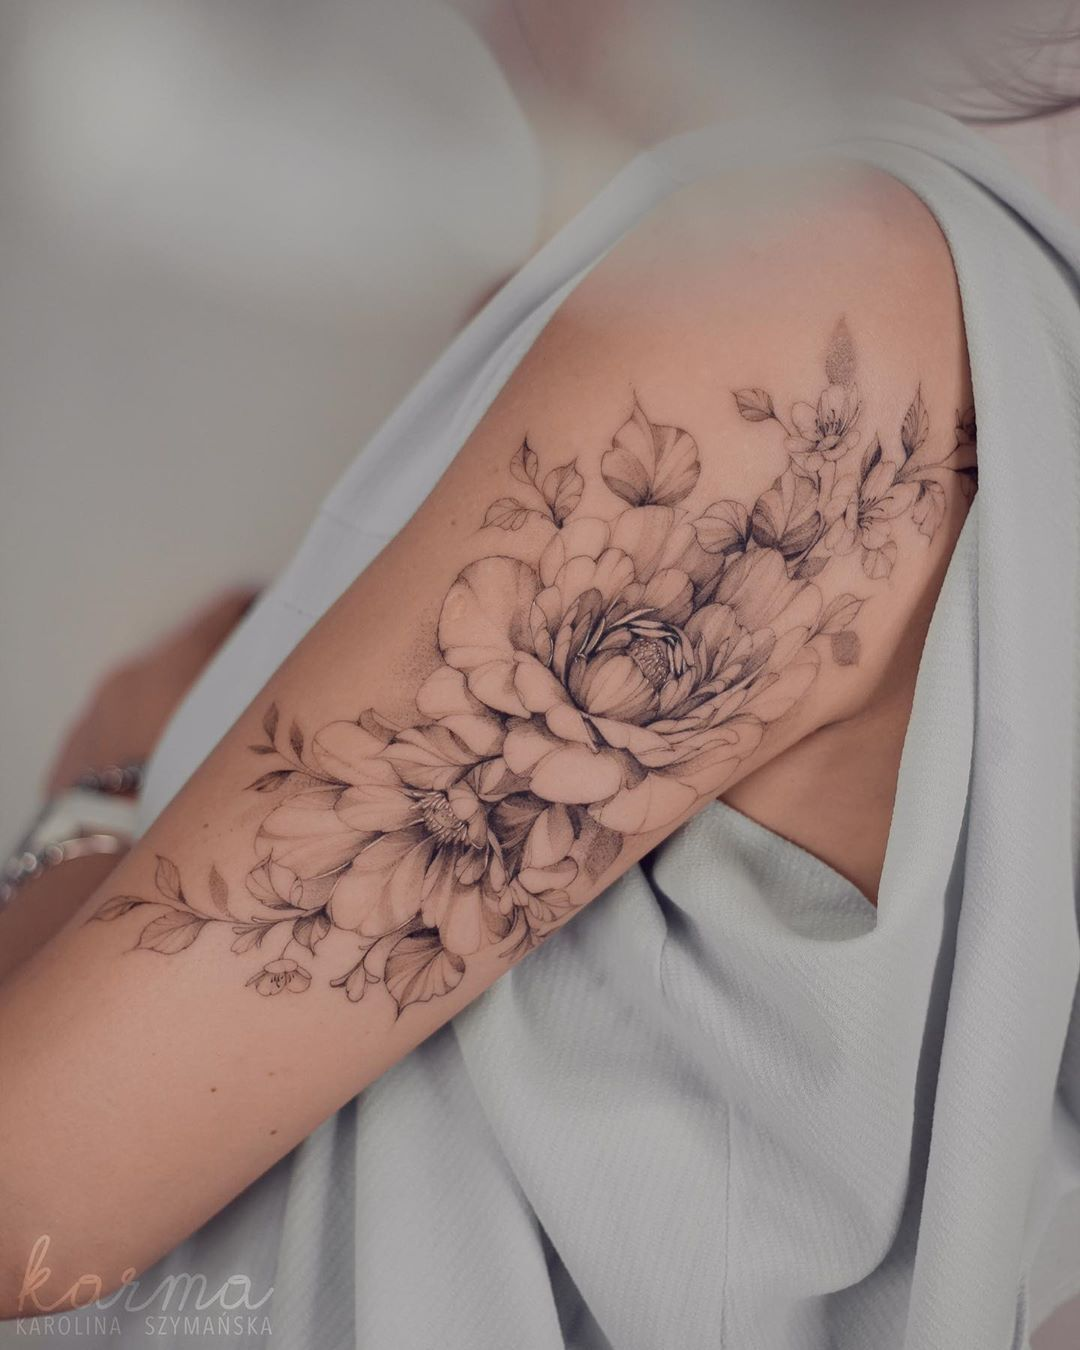 Tattoo artist Karolina Szymańska | Kraków, Poland | iNKPPL